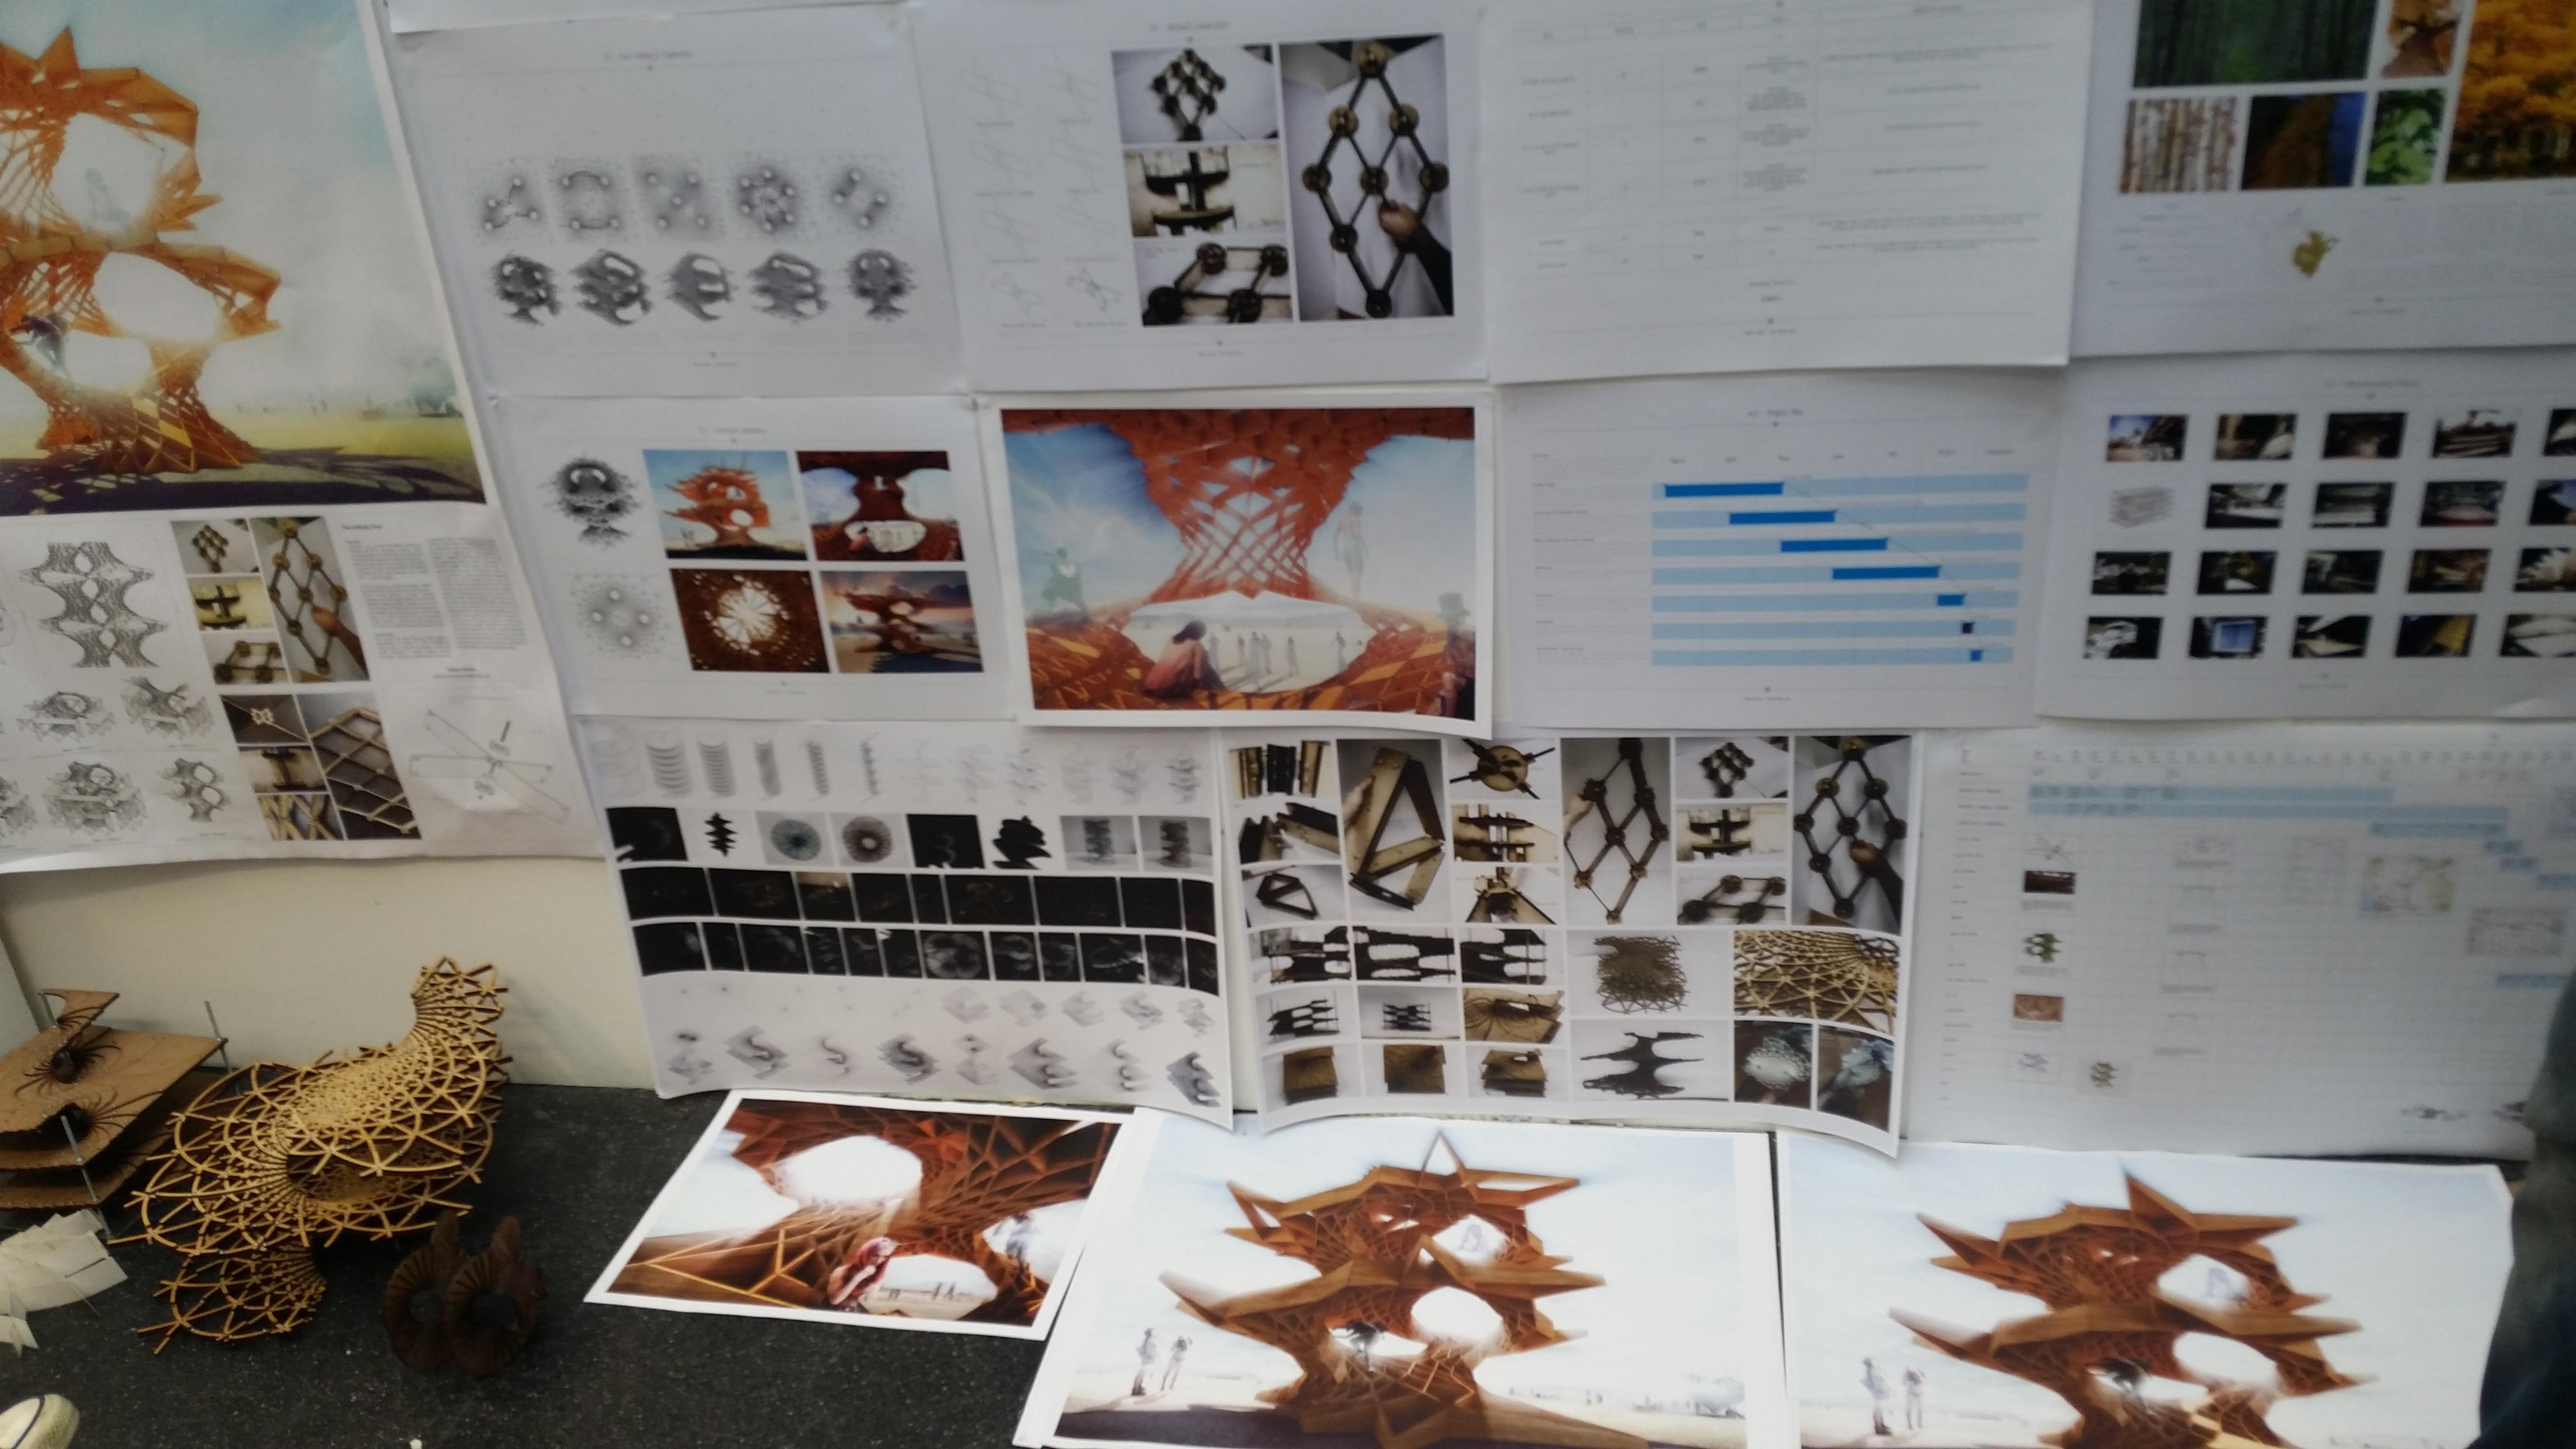 Tobias Power's Infinity Tree for Burning Man development